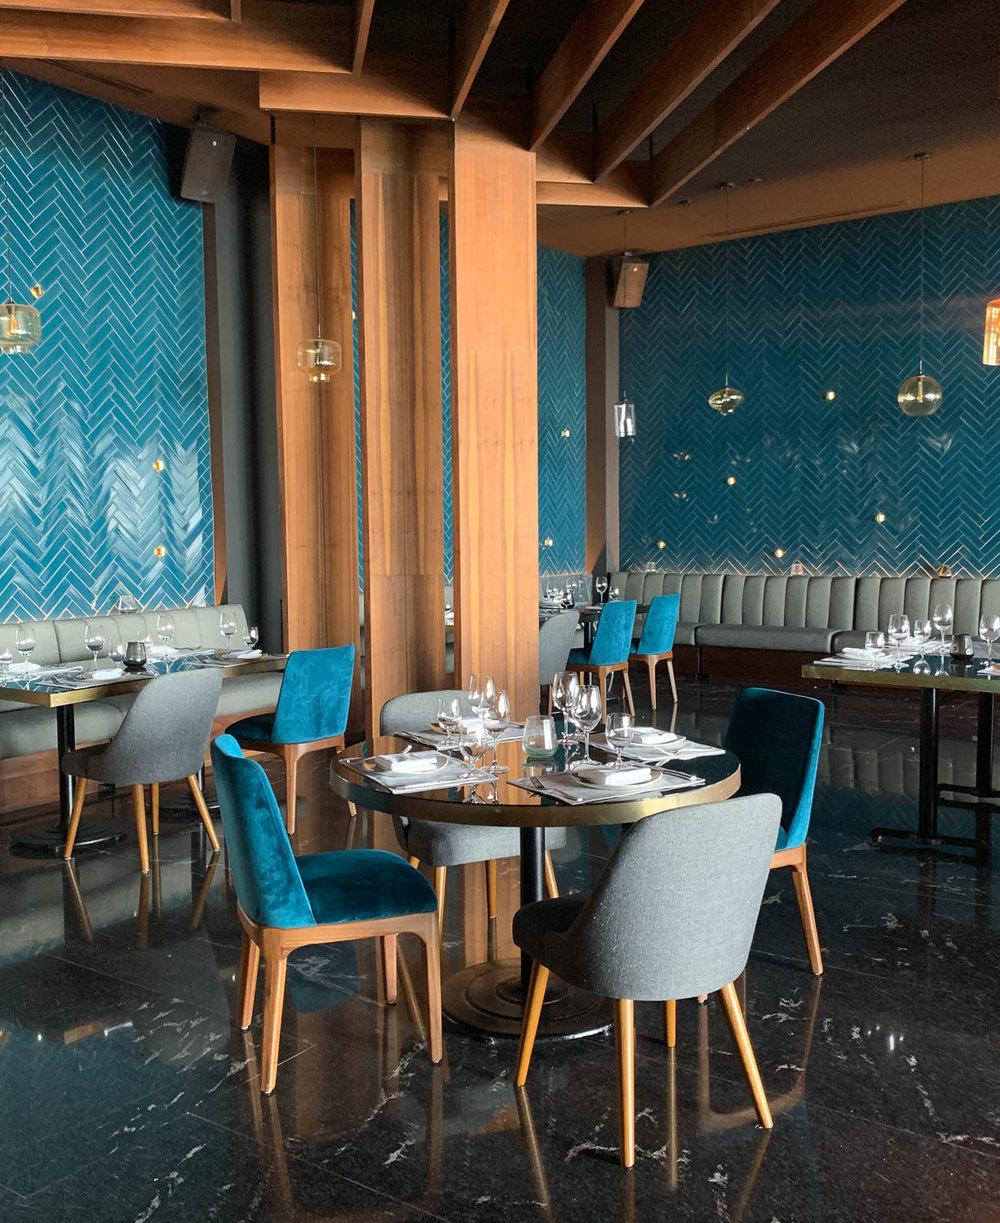 Best All-Inclusive Resort - Cabo All Inclusive Resort - Cabo Resort-2067.jpg